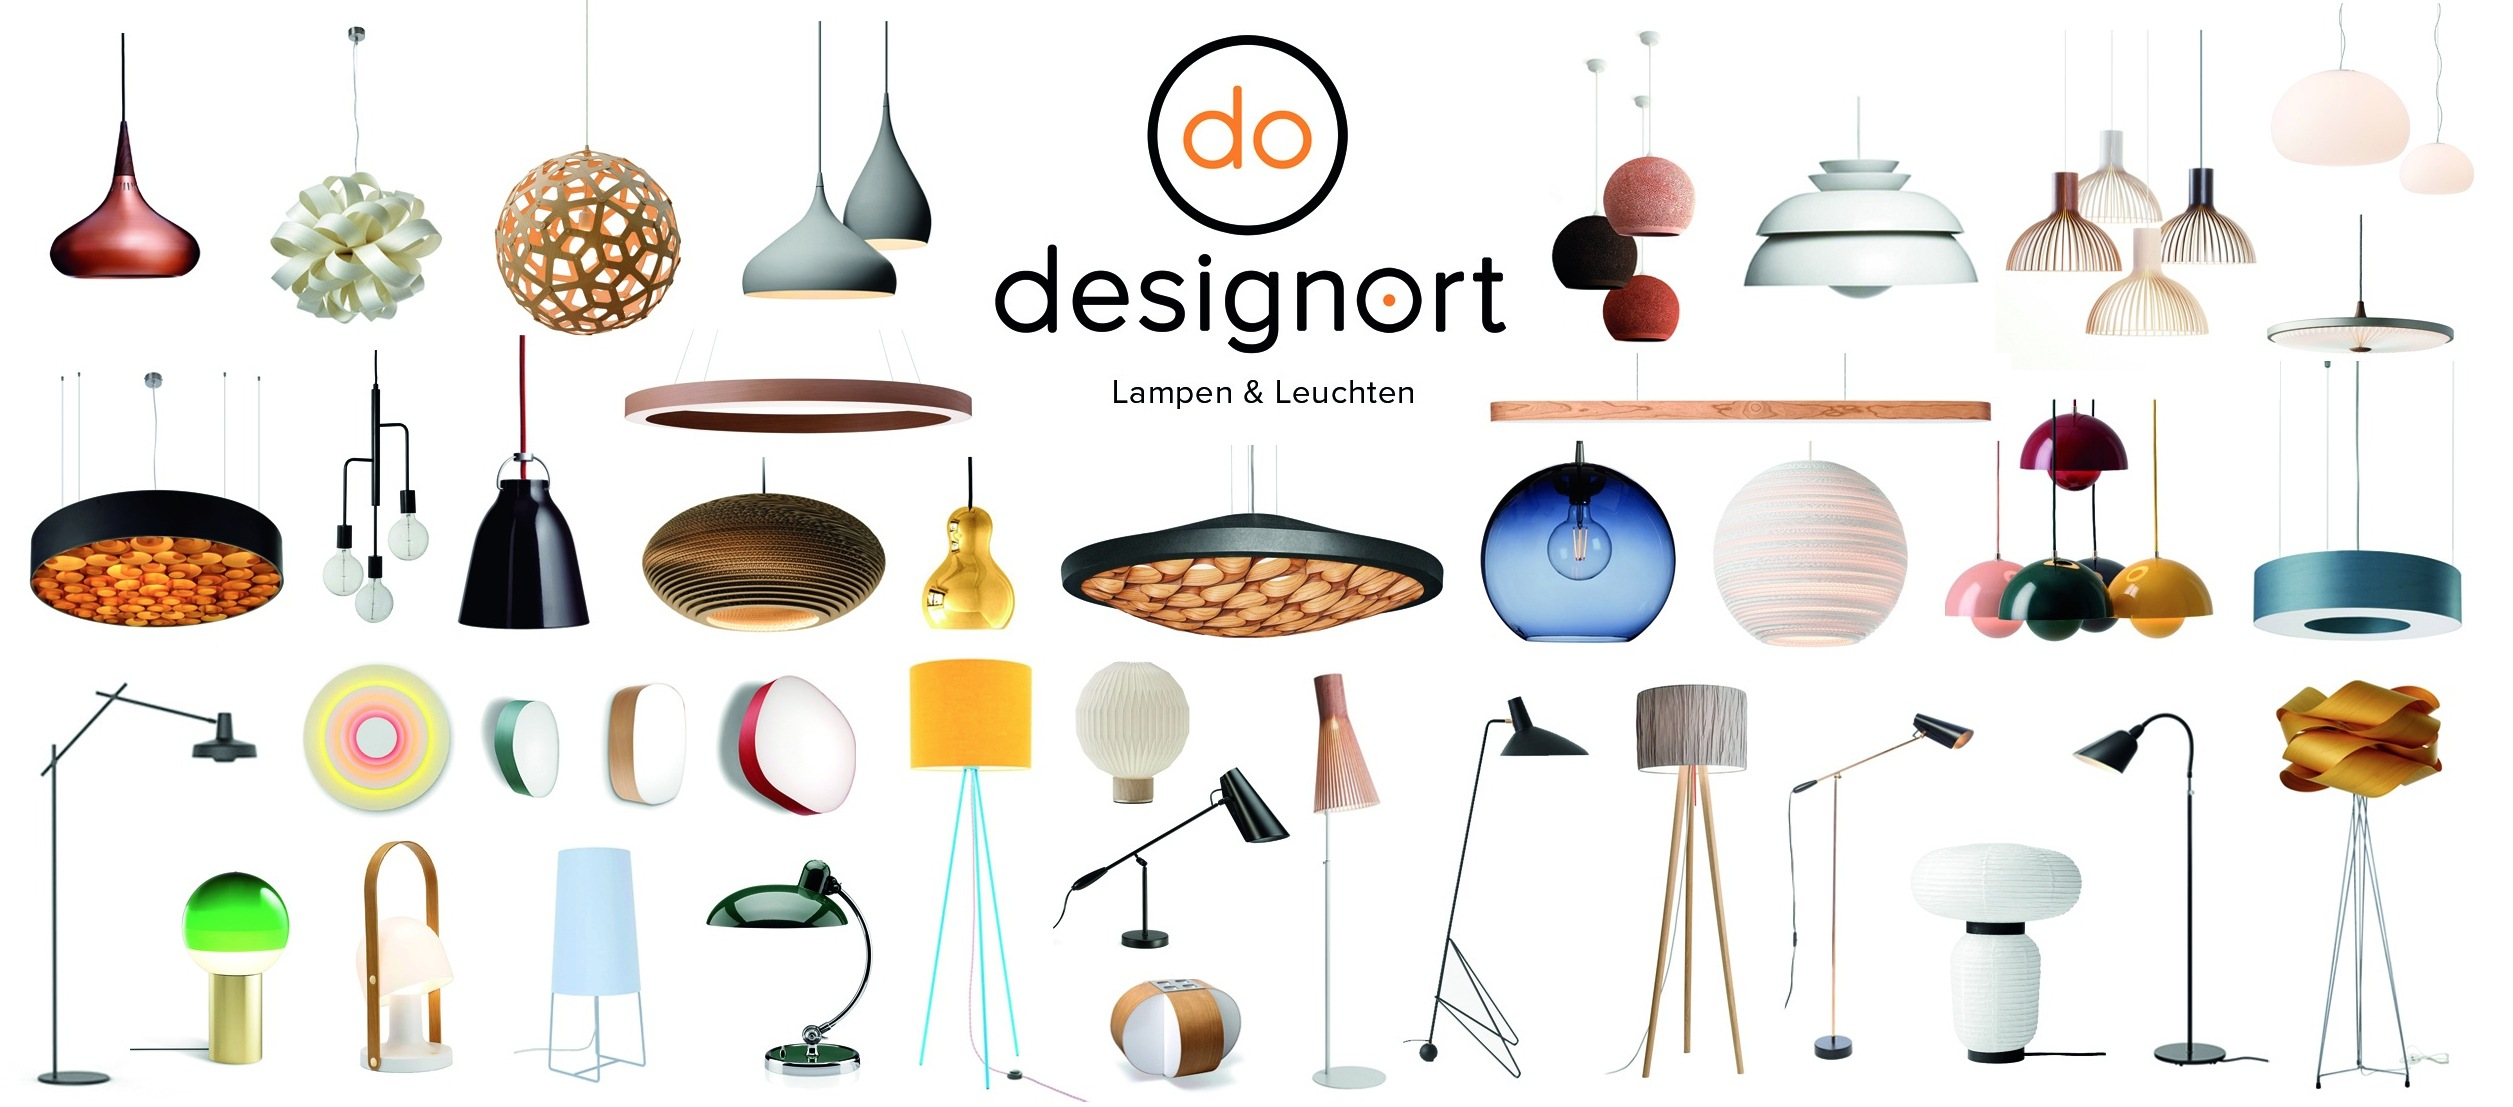 Lampenladen Onlineshop Designer Leuchten Berlin DesignOrt